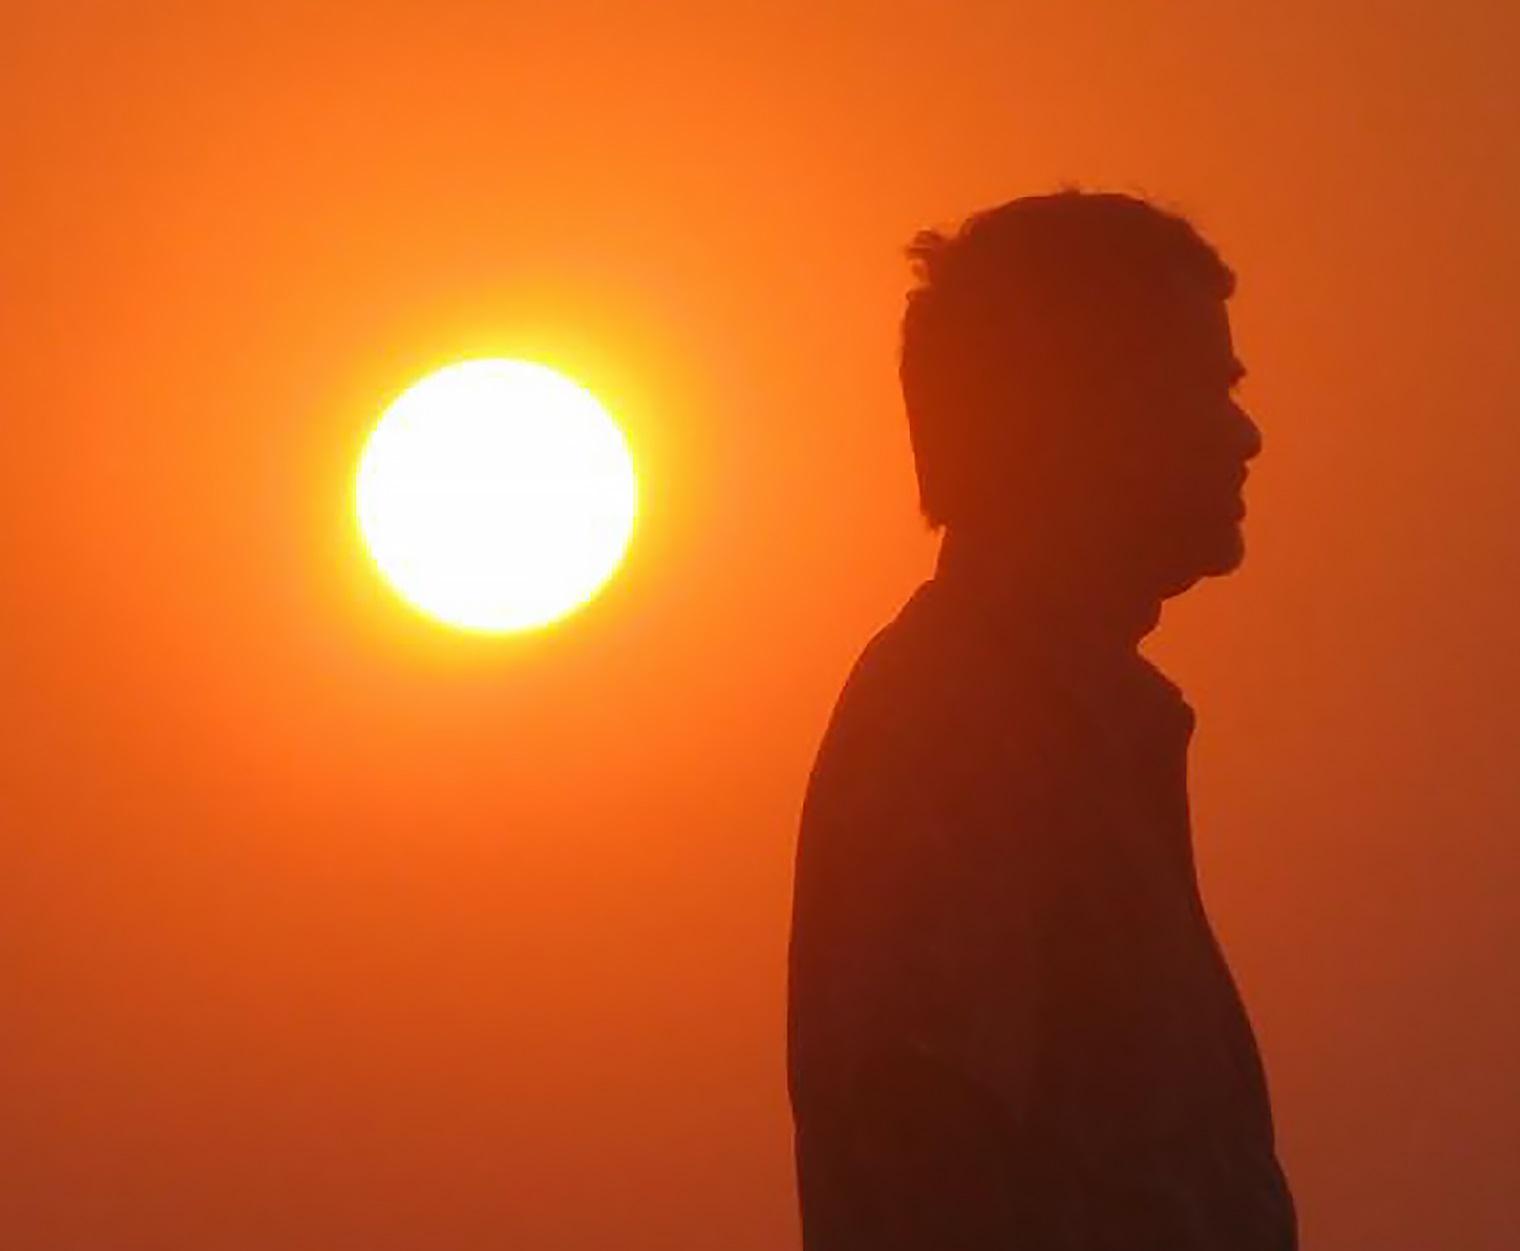 Homem sob o sol